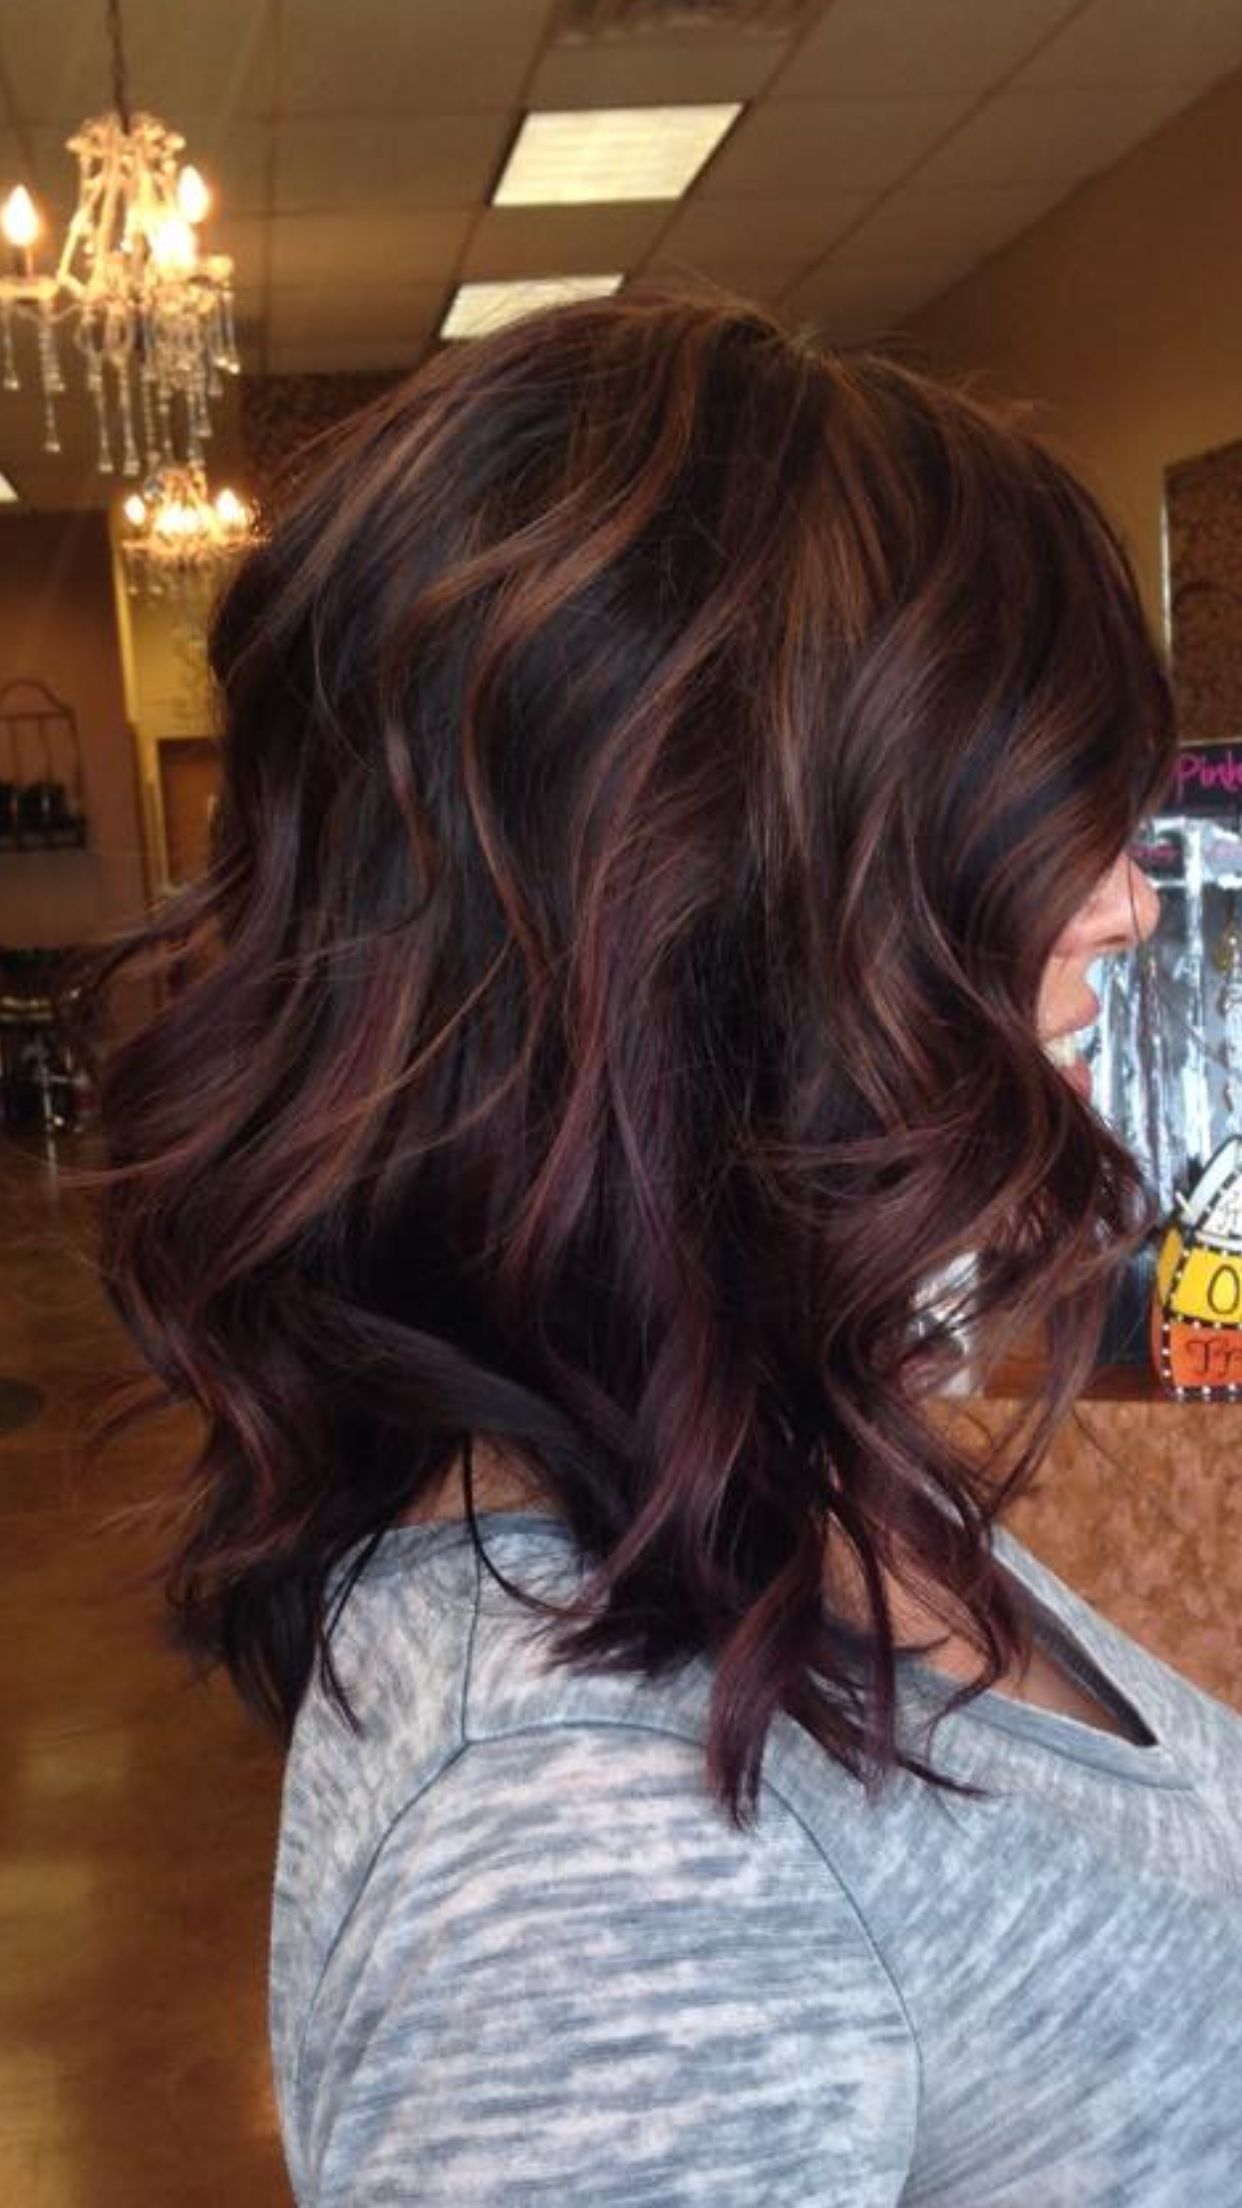 Pin By Samantha Krohn On Beauty Hair Styles Trendy Hair Color Curly Hair Styles